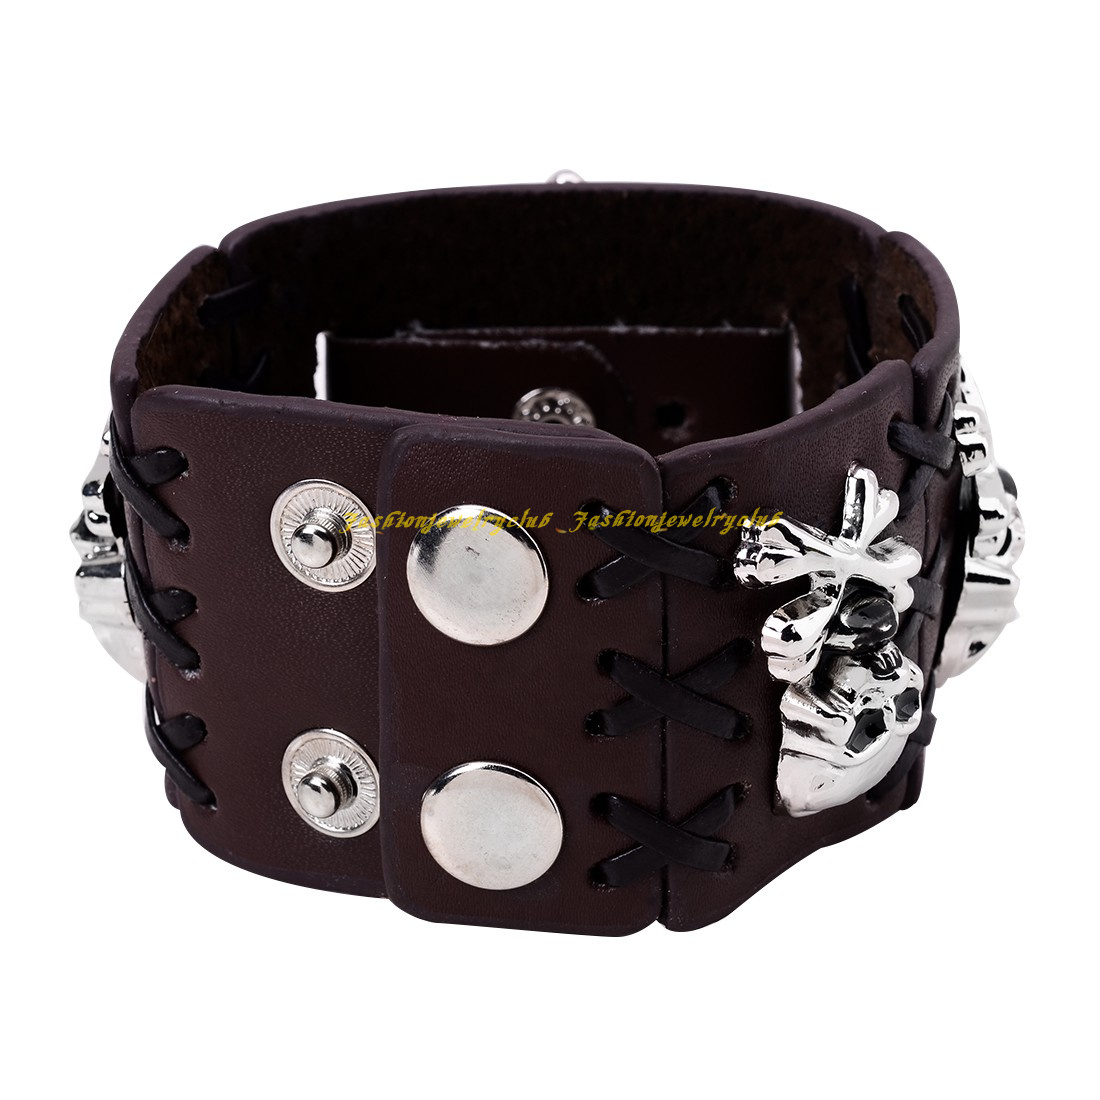 brown_leather_band_quartz_wrist_watch_men_women_punk_skull_digital_dial_watches_2.jpg